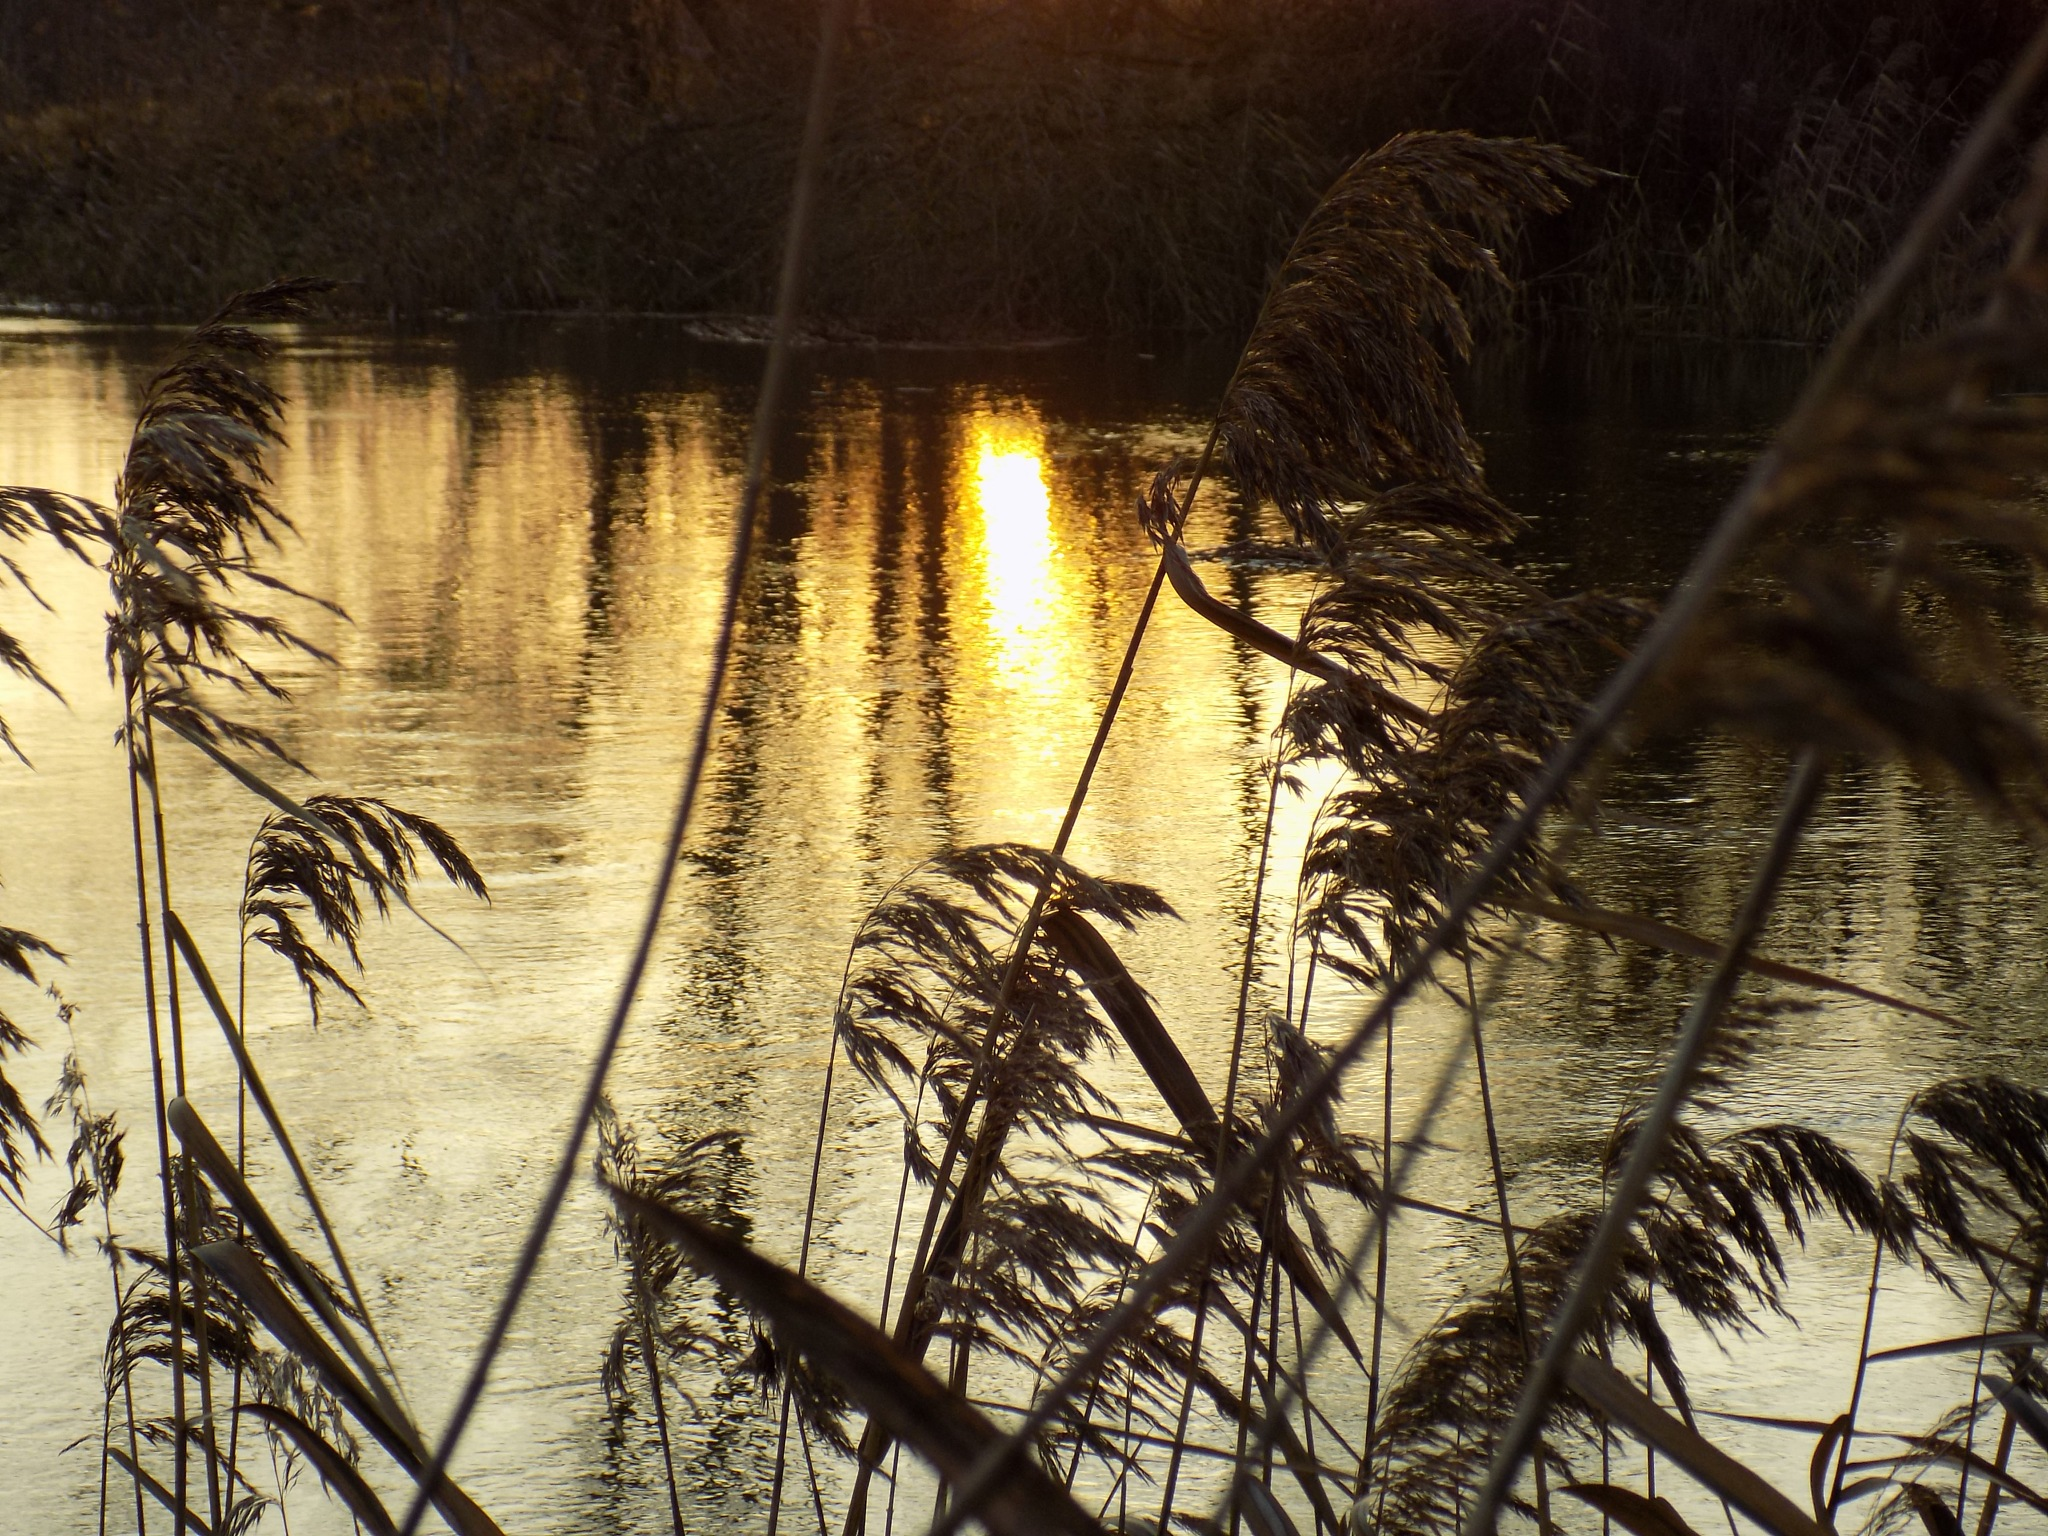 In evening by uzkuraitiene62